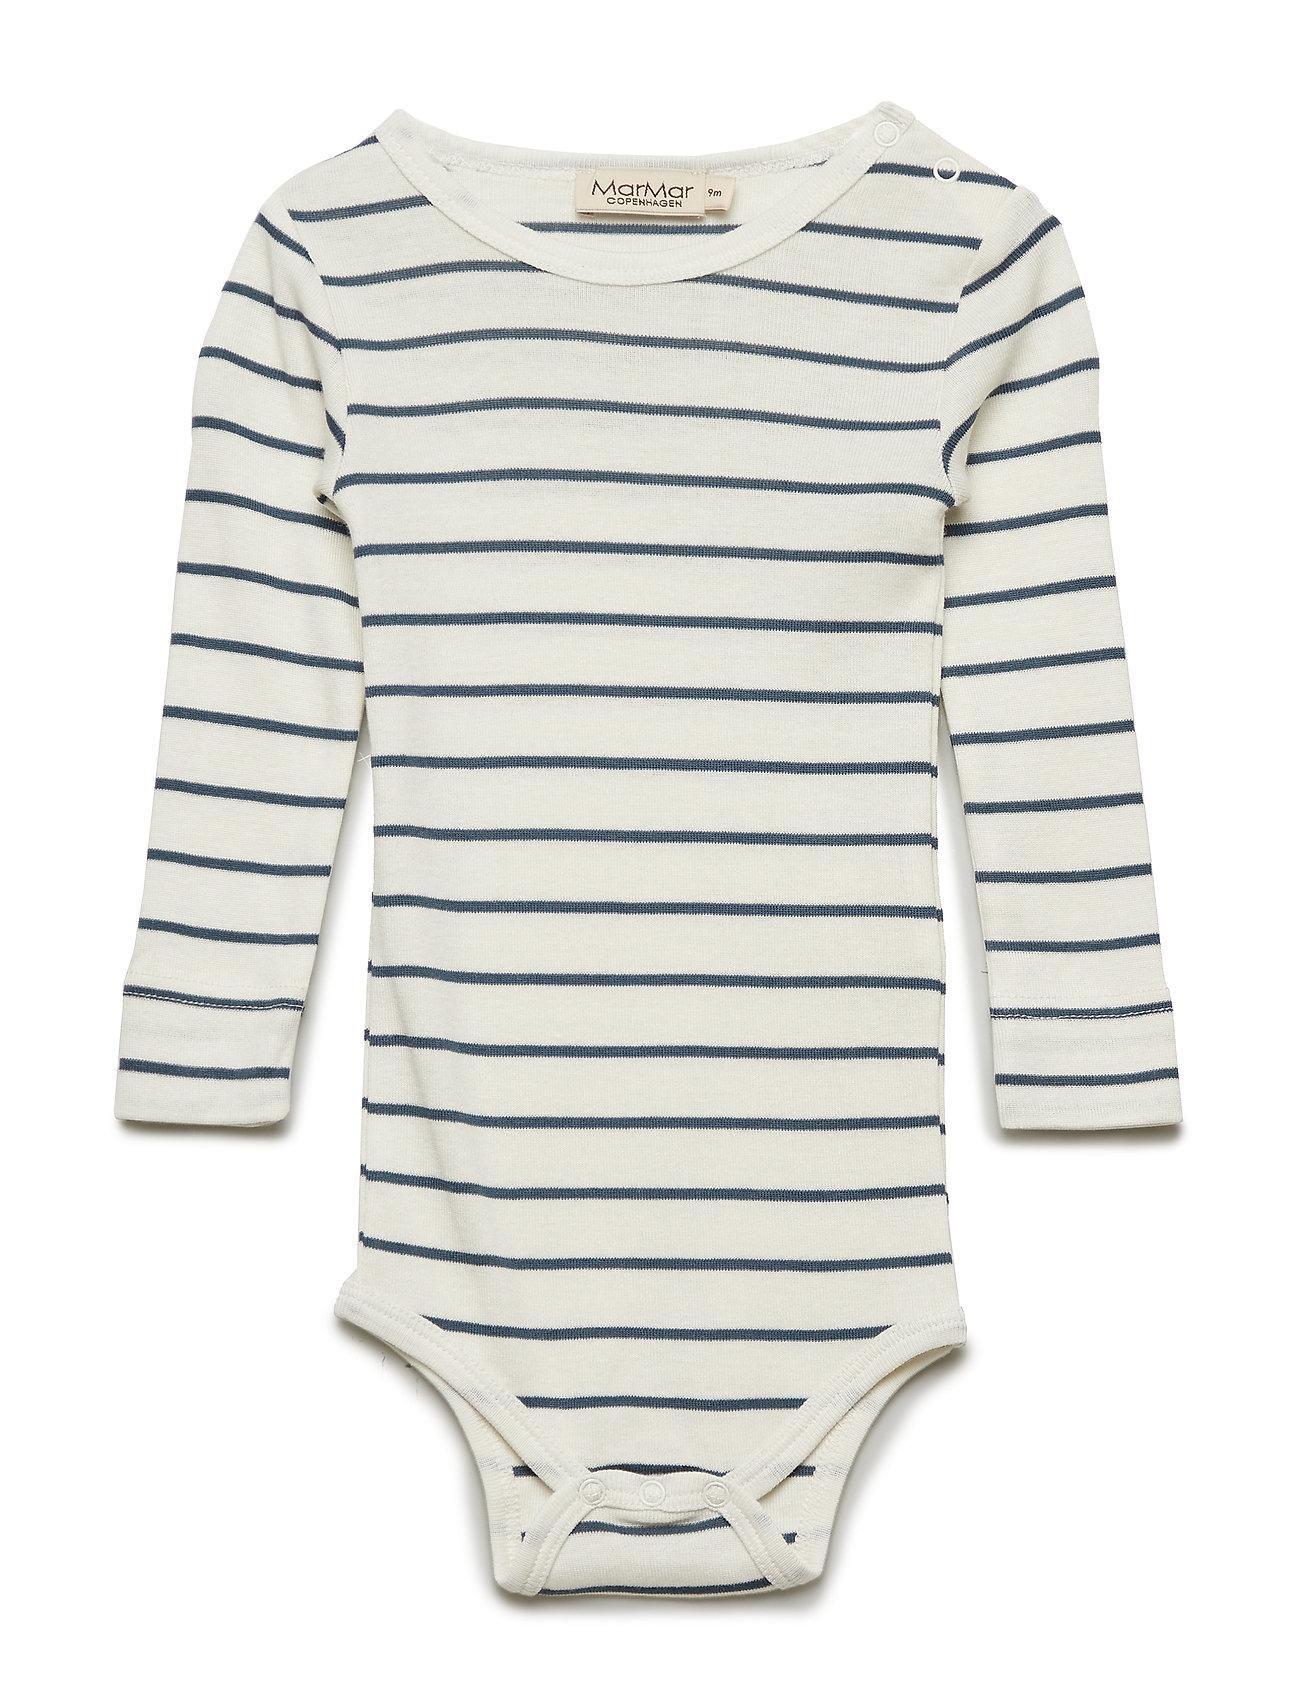 c1c91f987f39 Plain Body Ls (Shaded Blue Stripe) (£29) - MarMar Cph -